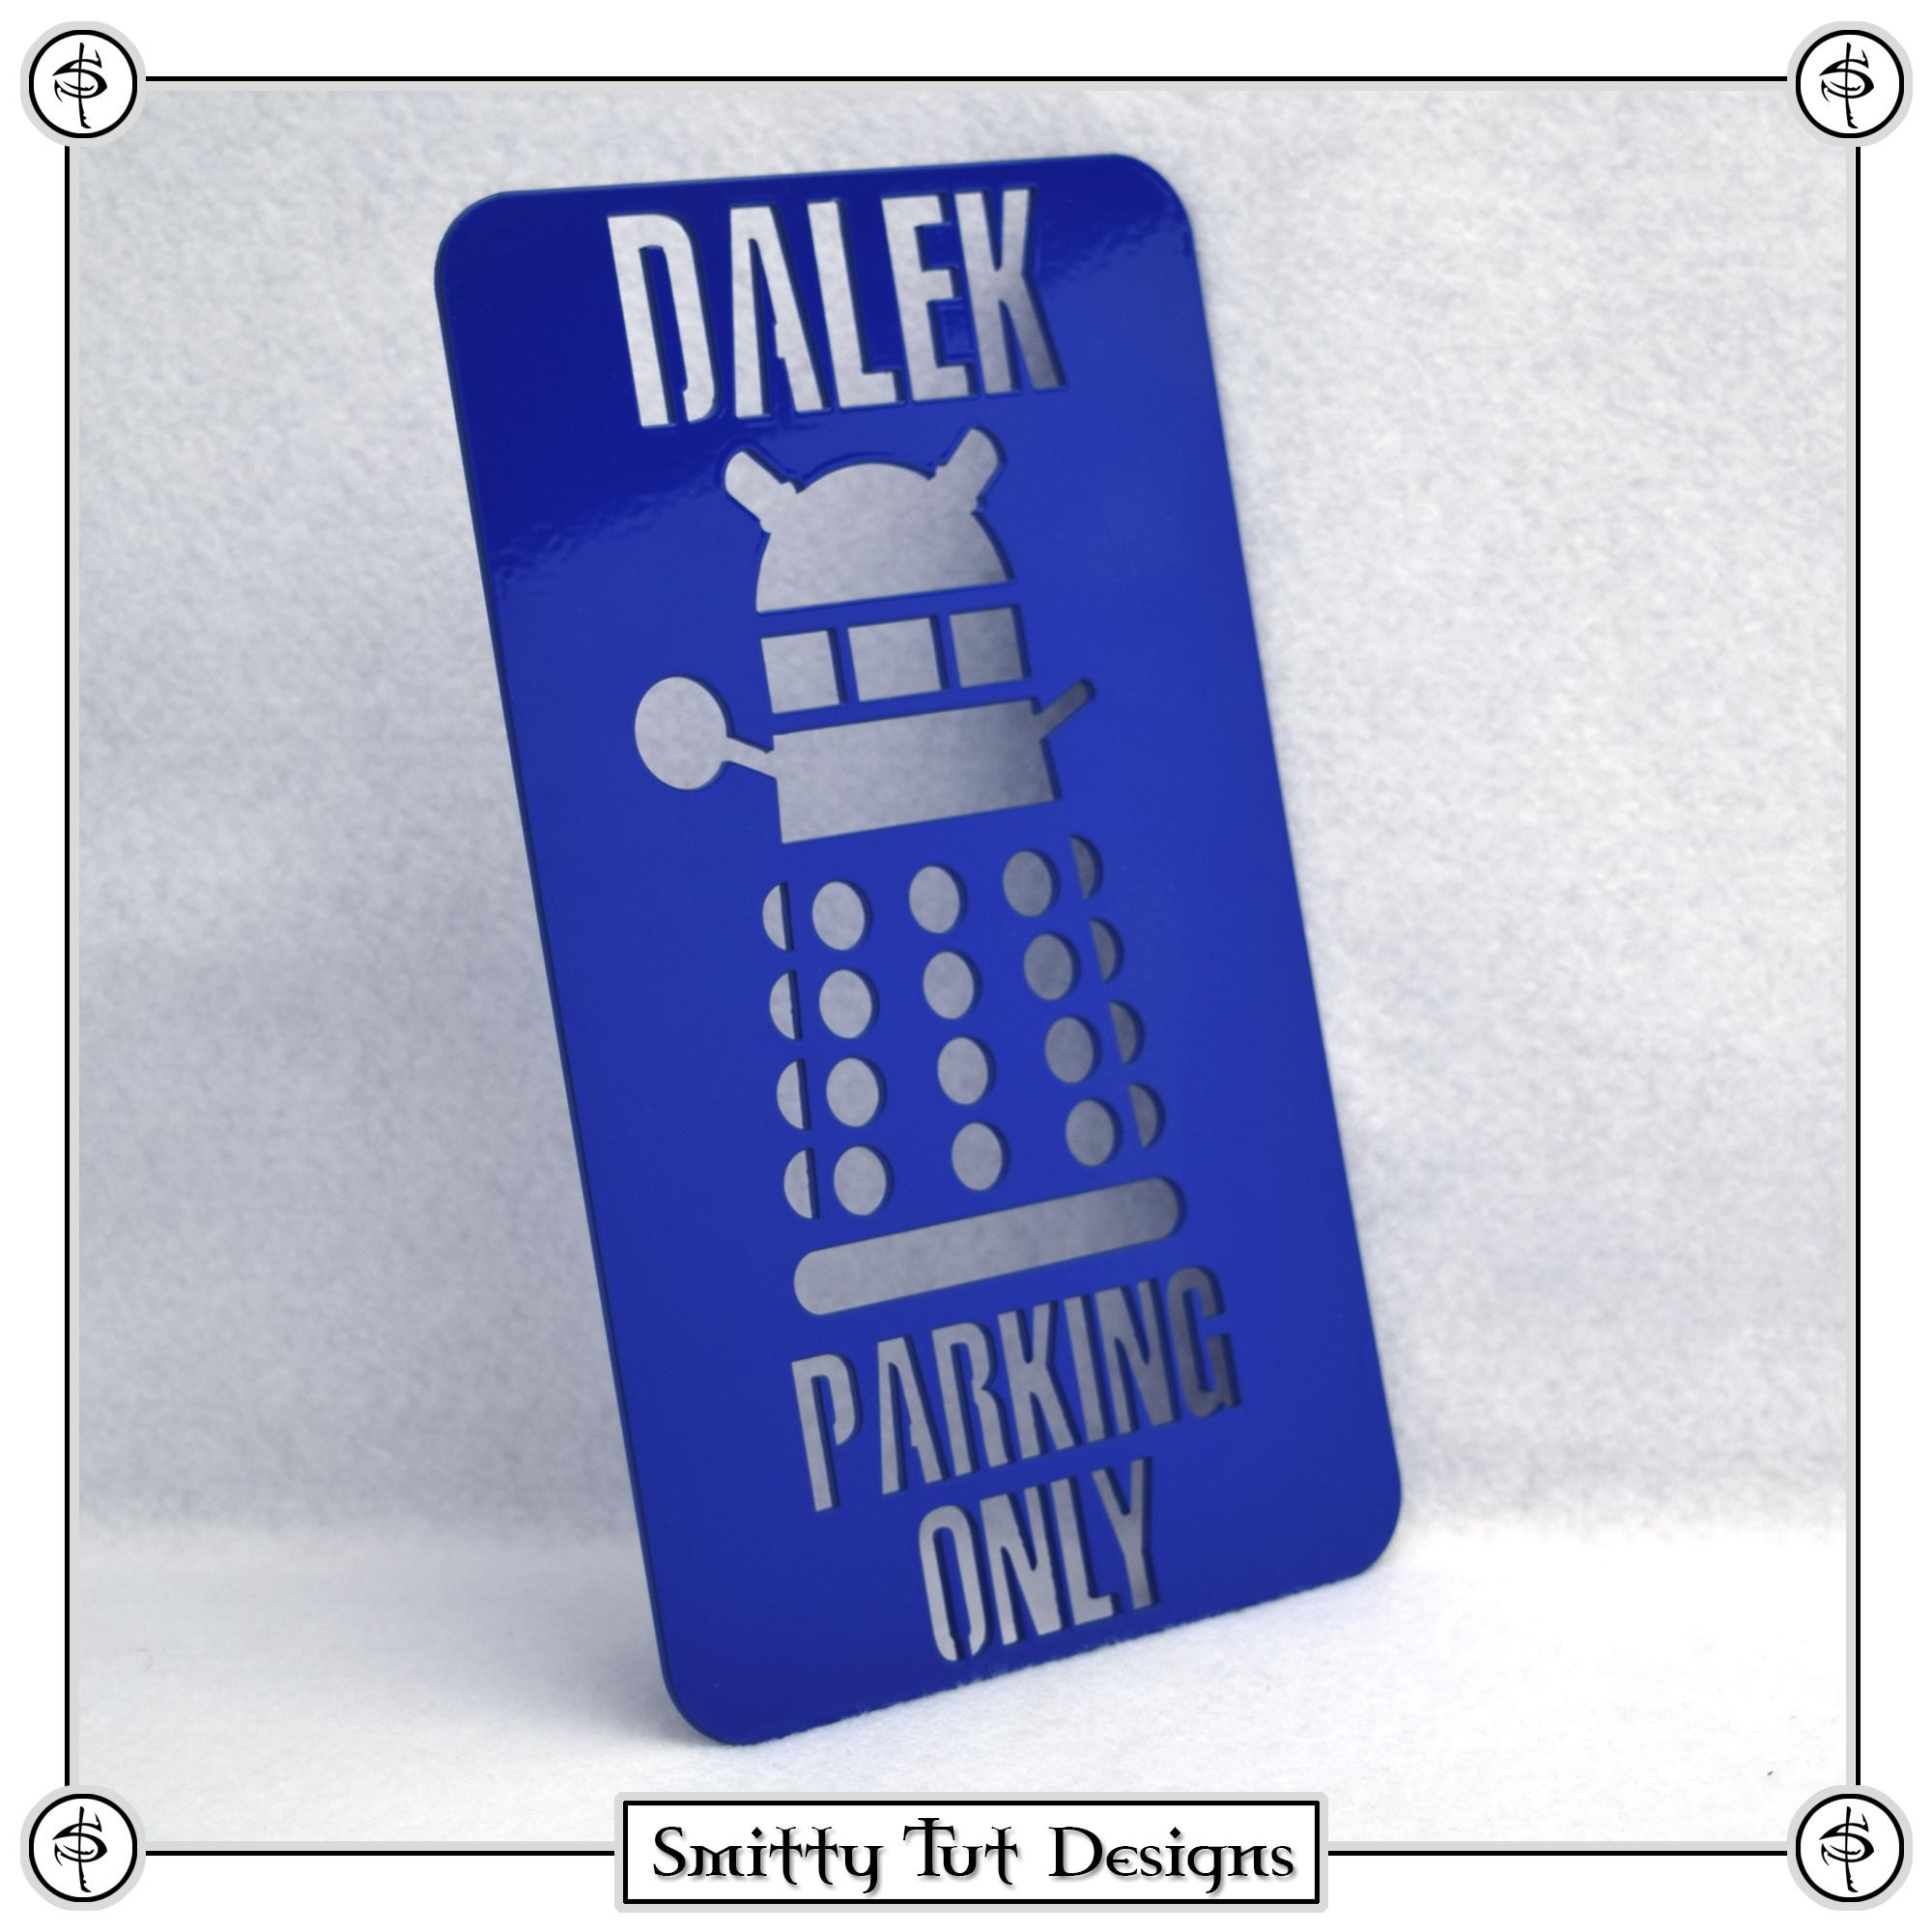 Dalek Side